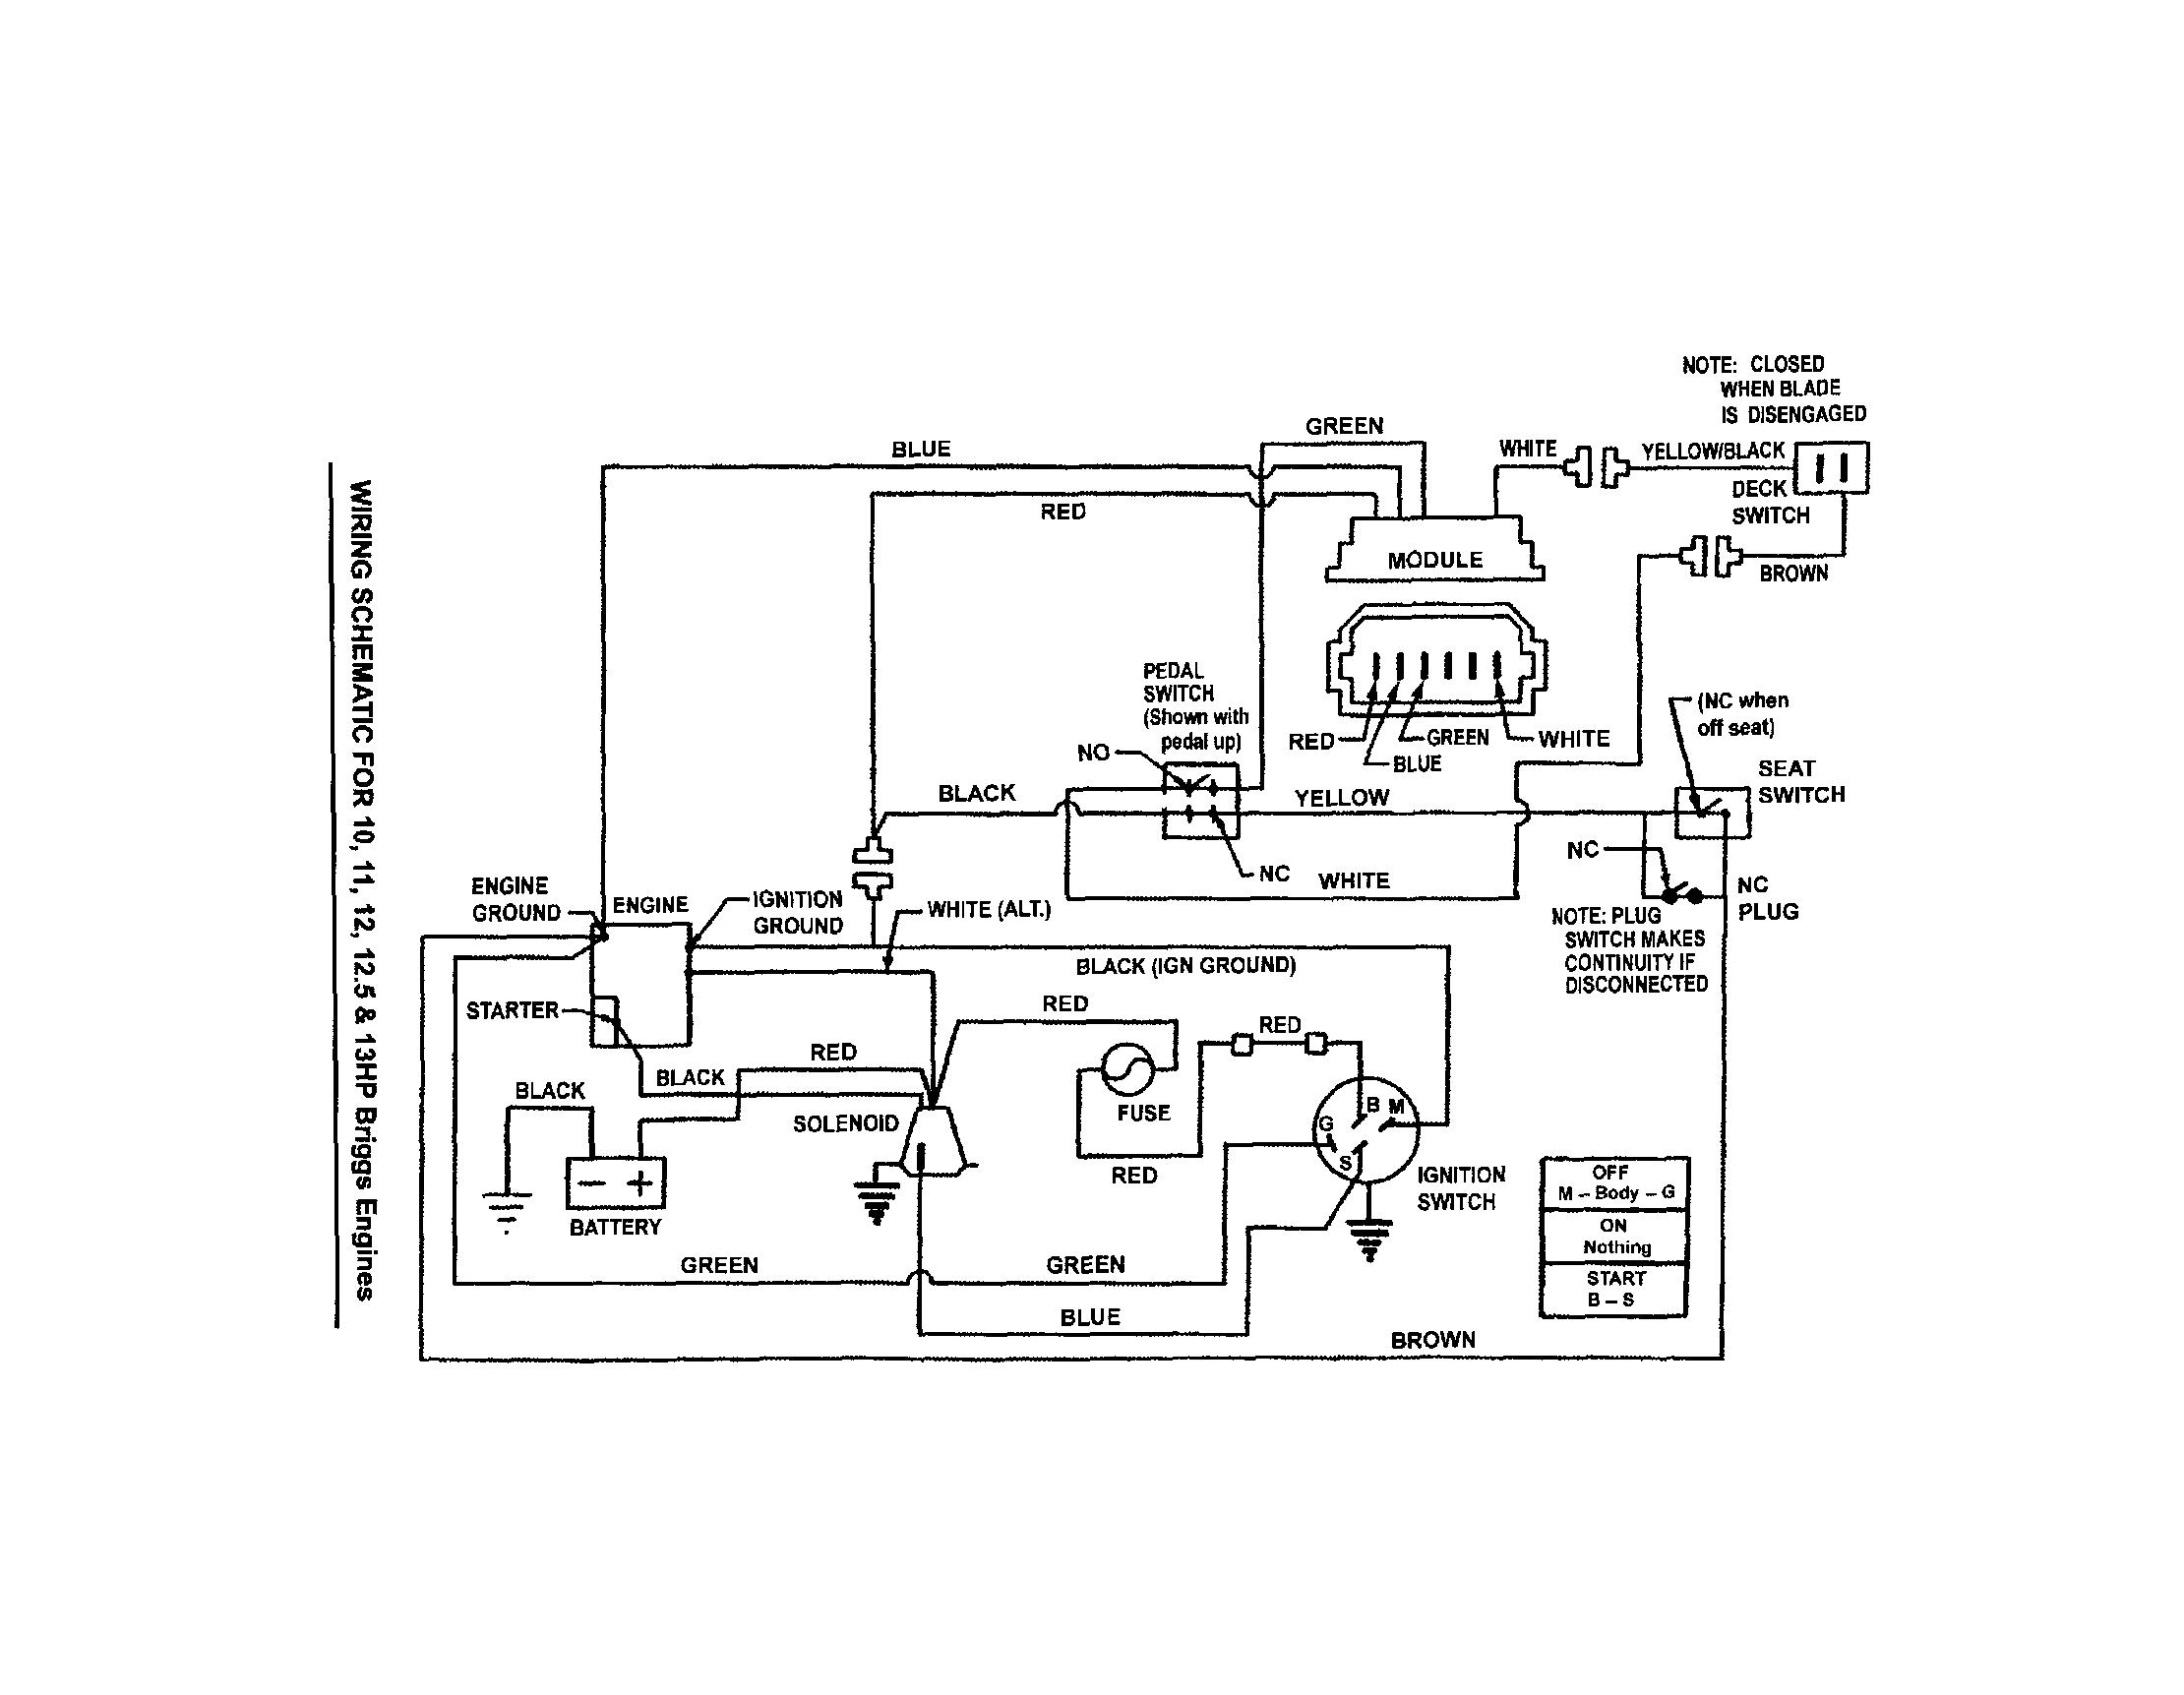 Yamaha G9 Wiring Diagram Golf Cart Club Wiring-Diagram